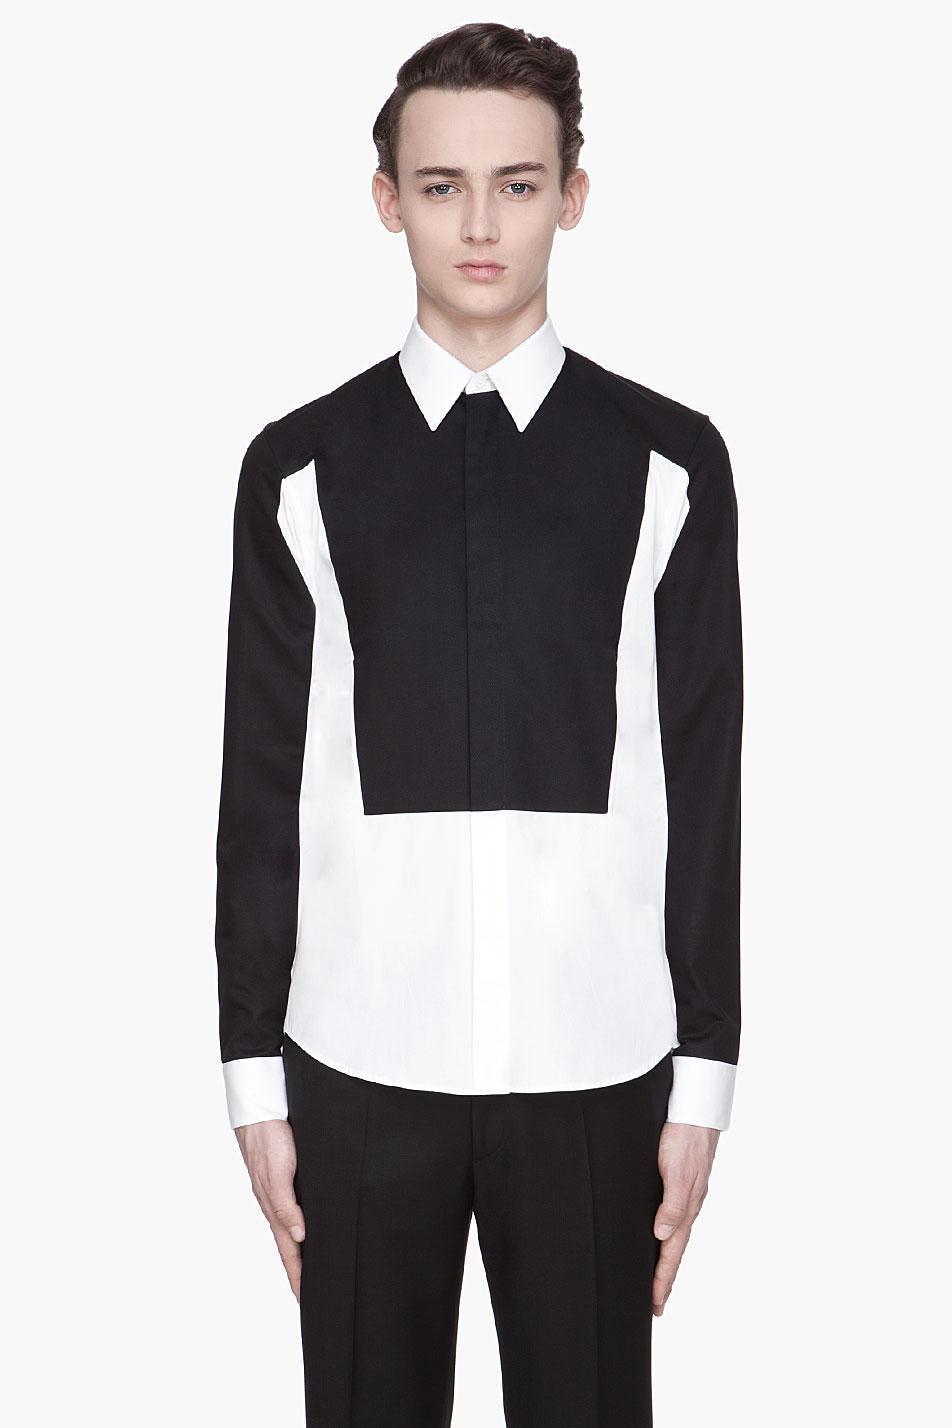 Givenchy White Amp Black Trompe Loeil Contrast Shirt